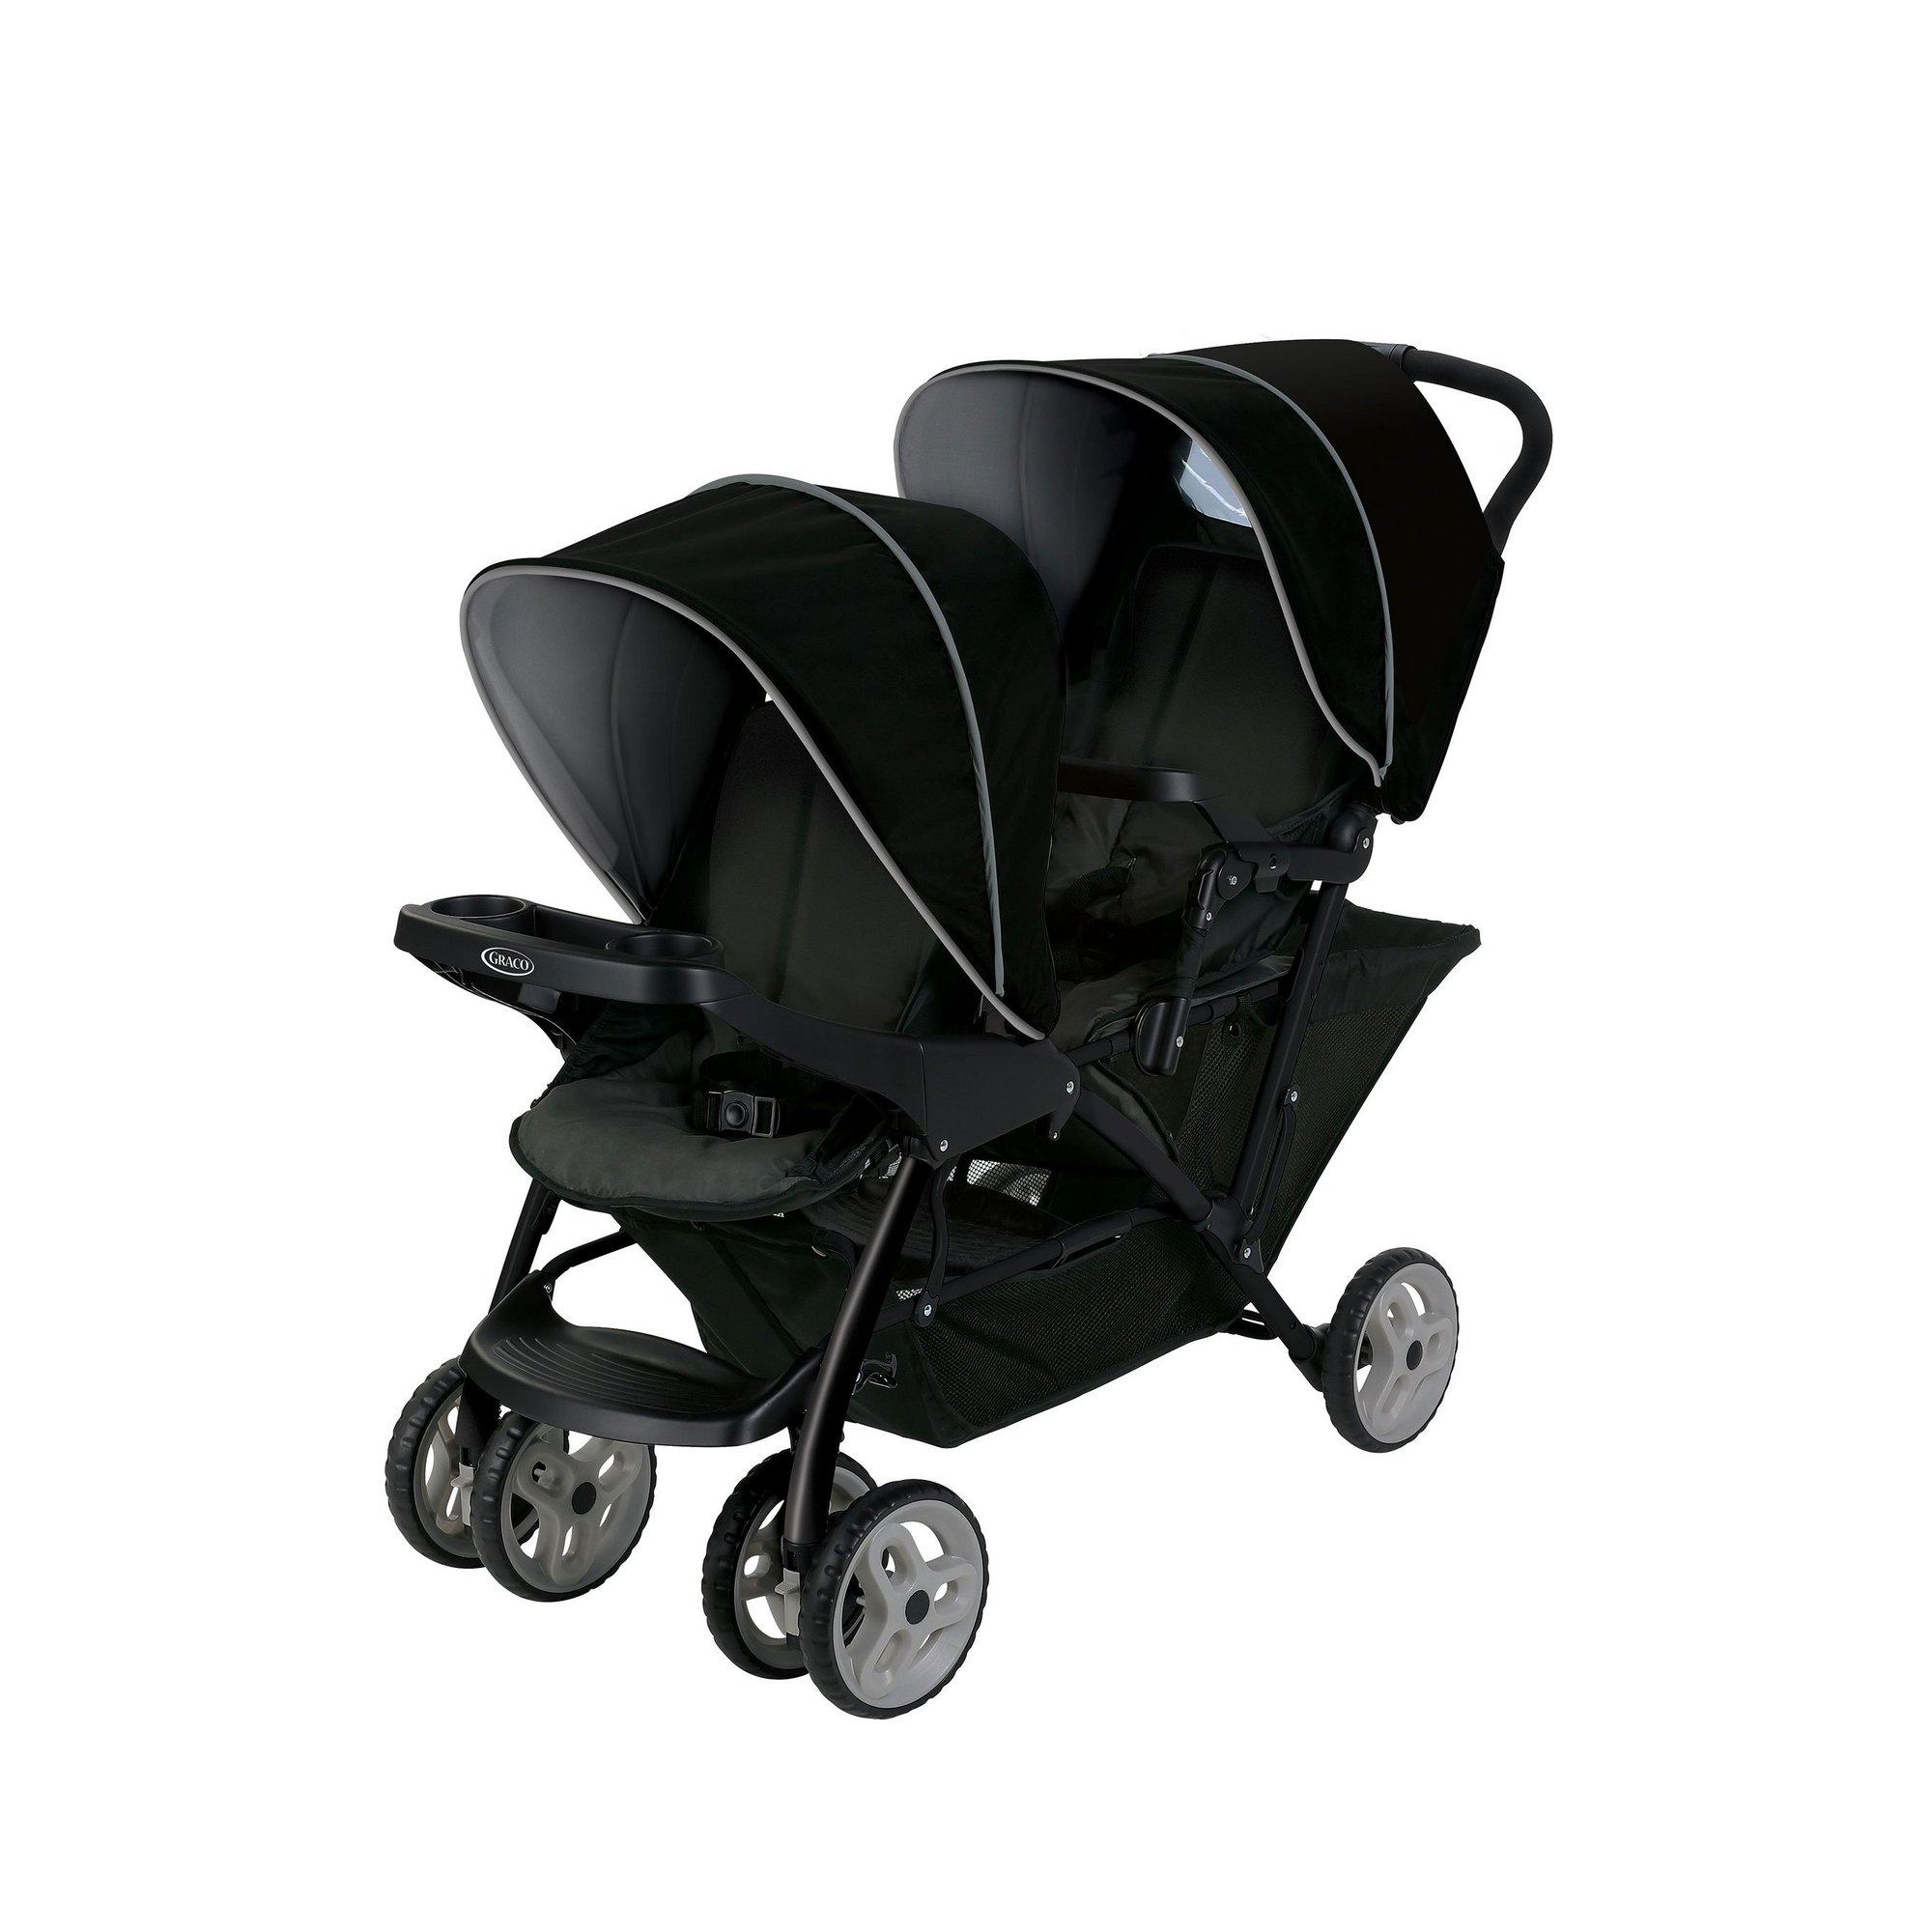 Image of Graco Black/Grey Stadium Duo Tandem Stroller